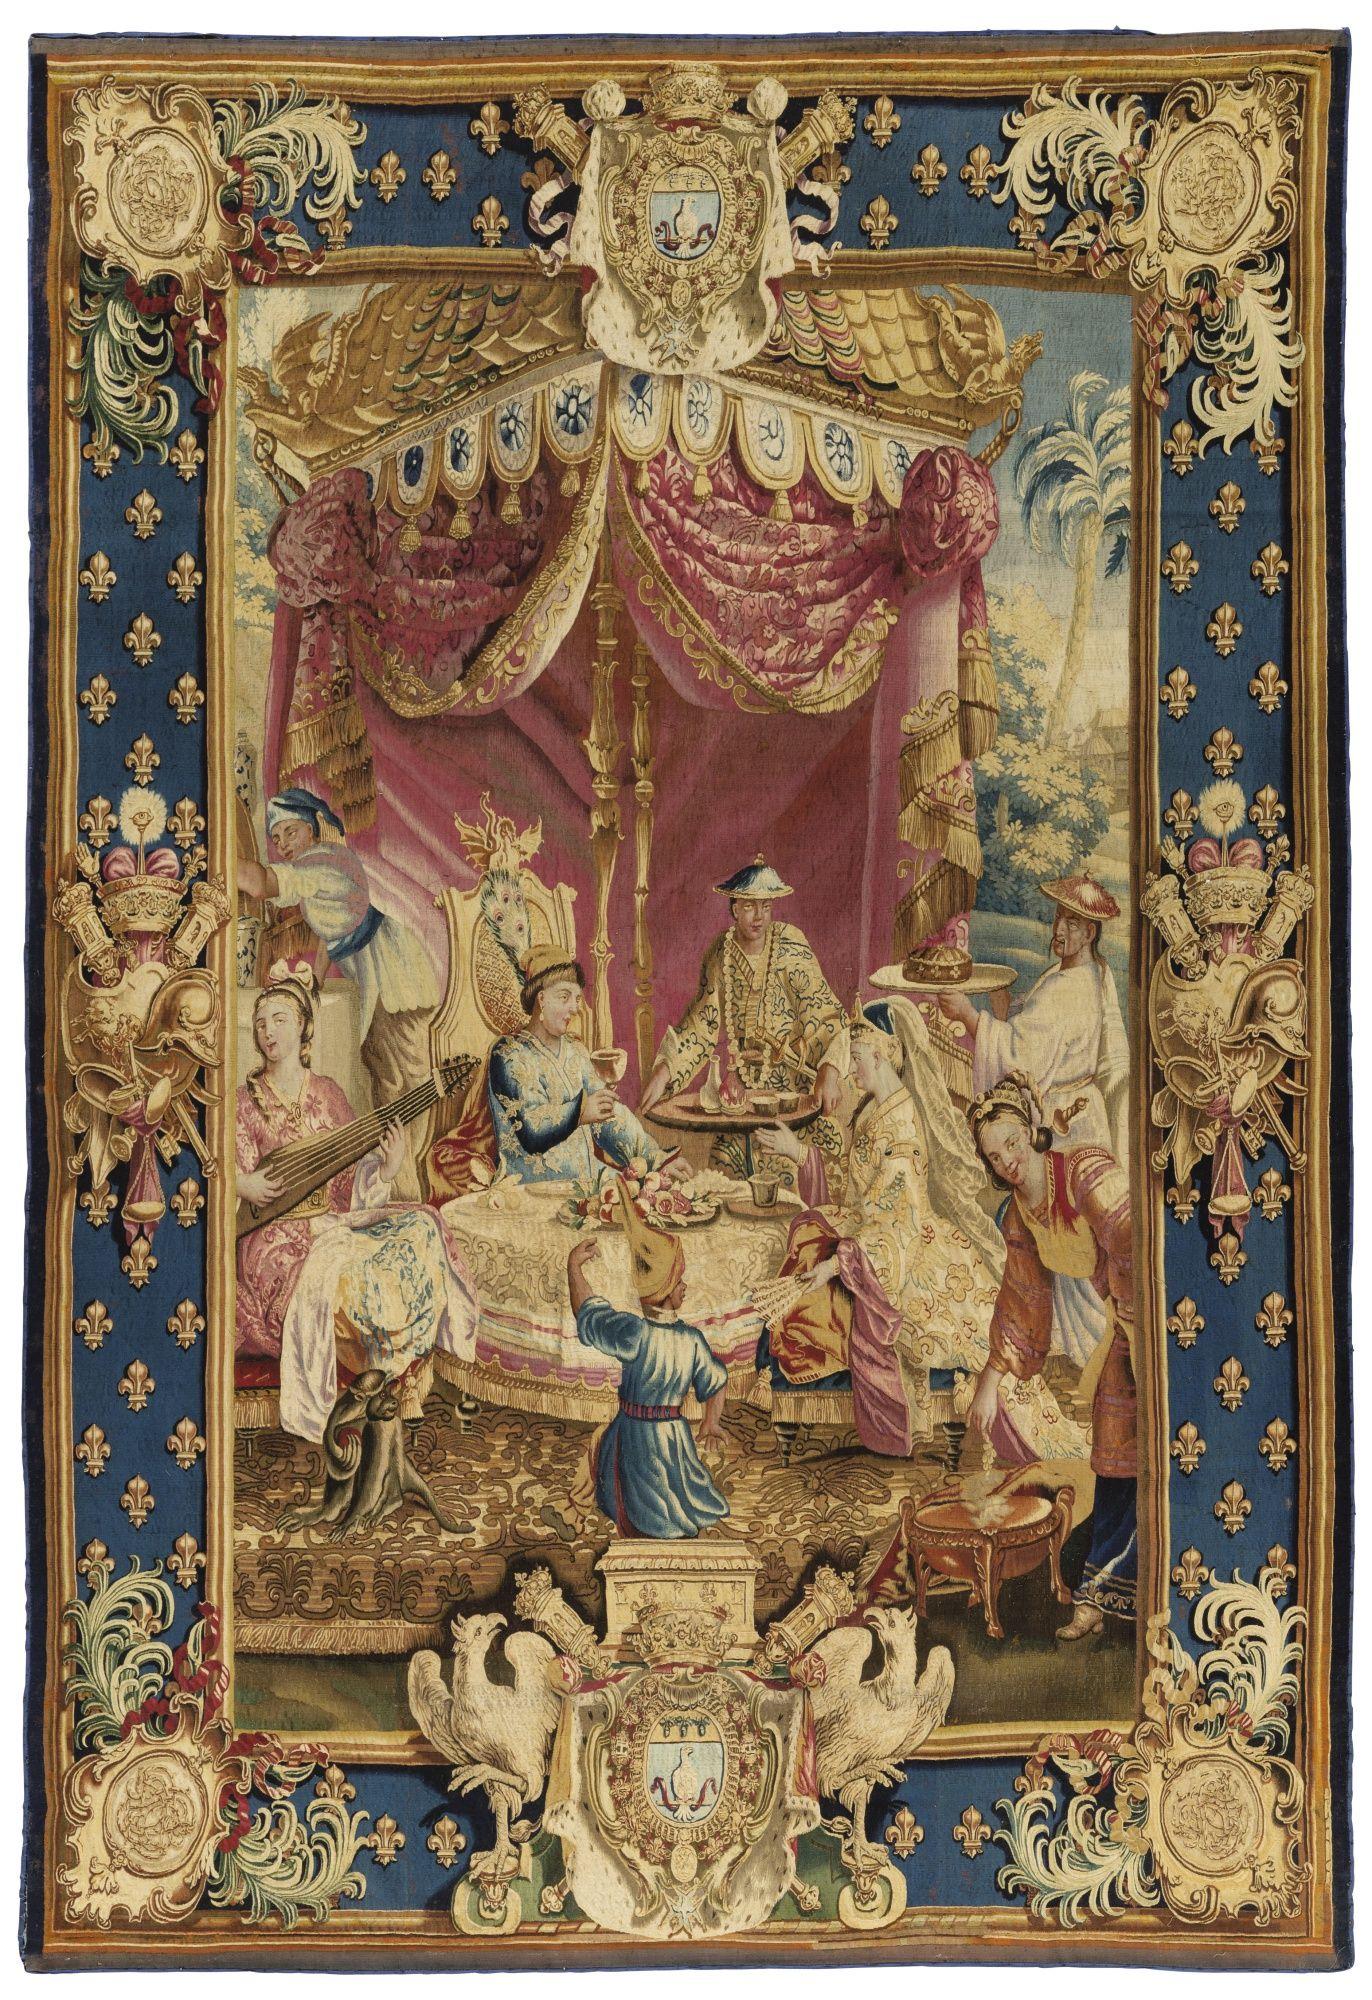 A Tapestry La Collation From The Series L Histoire De L